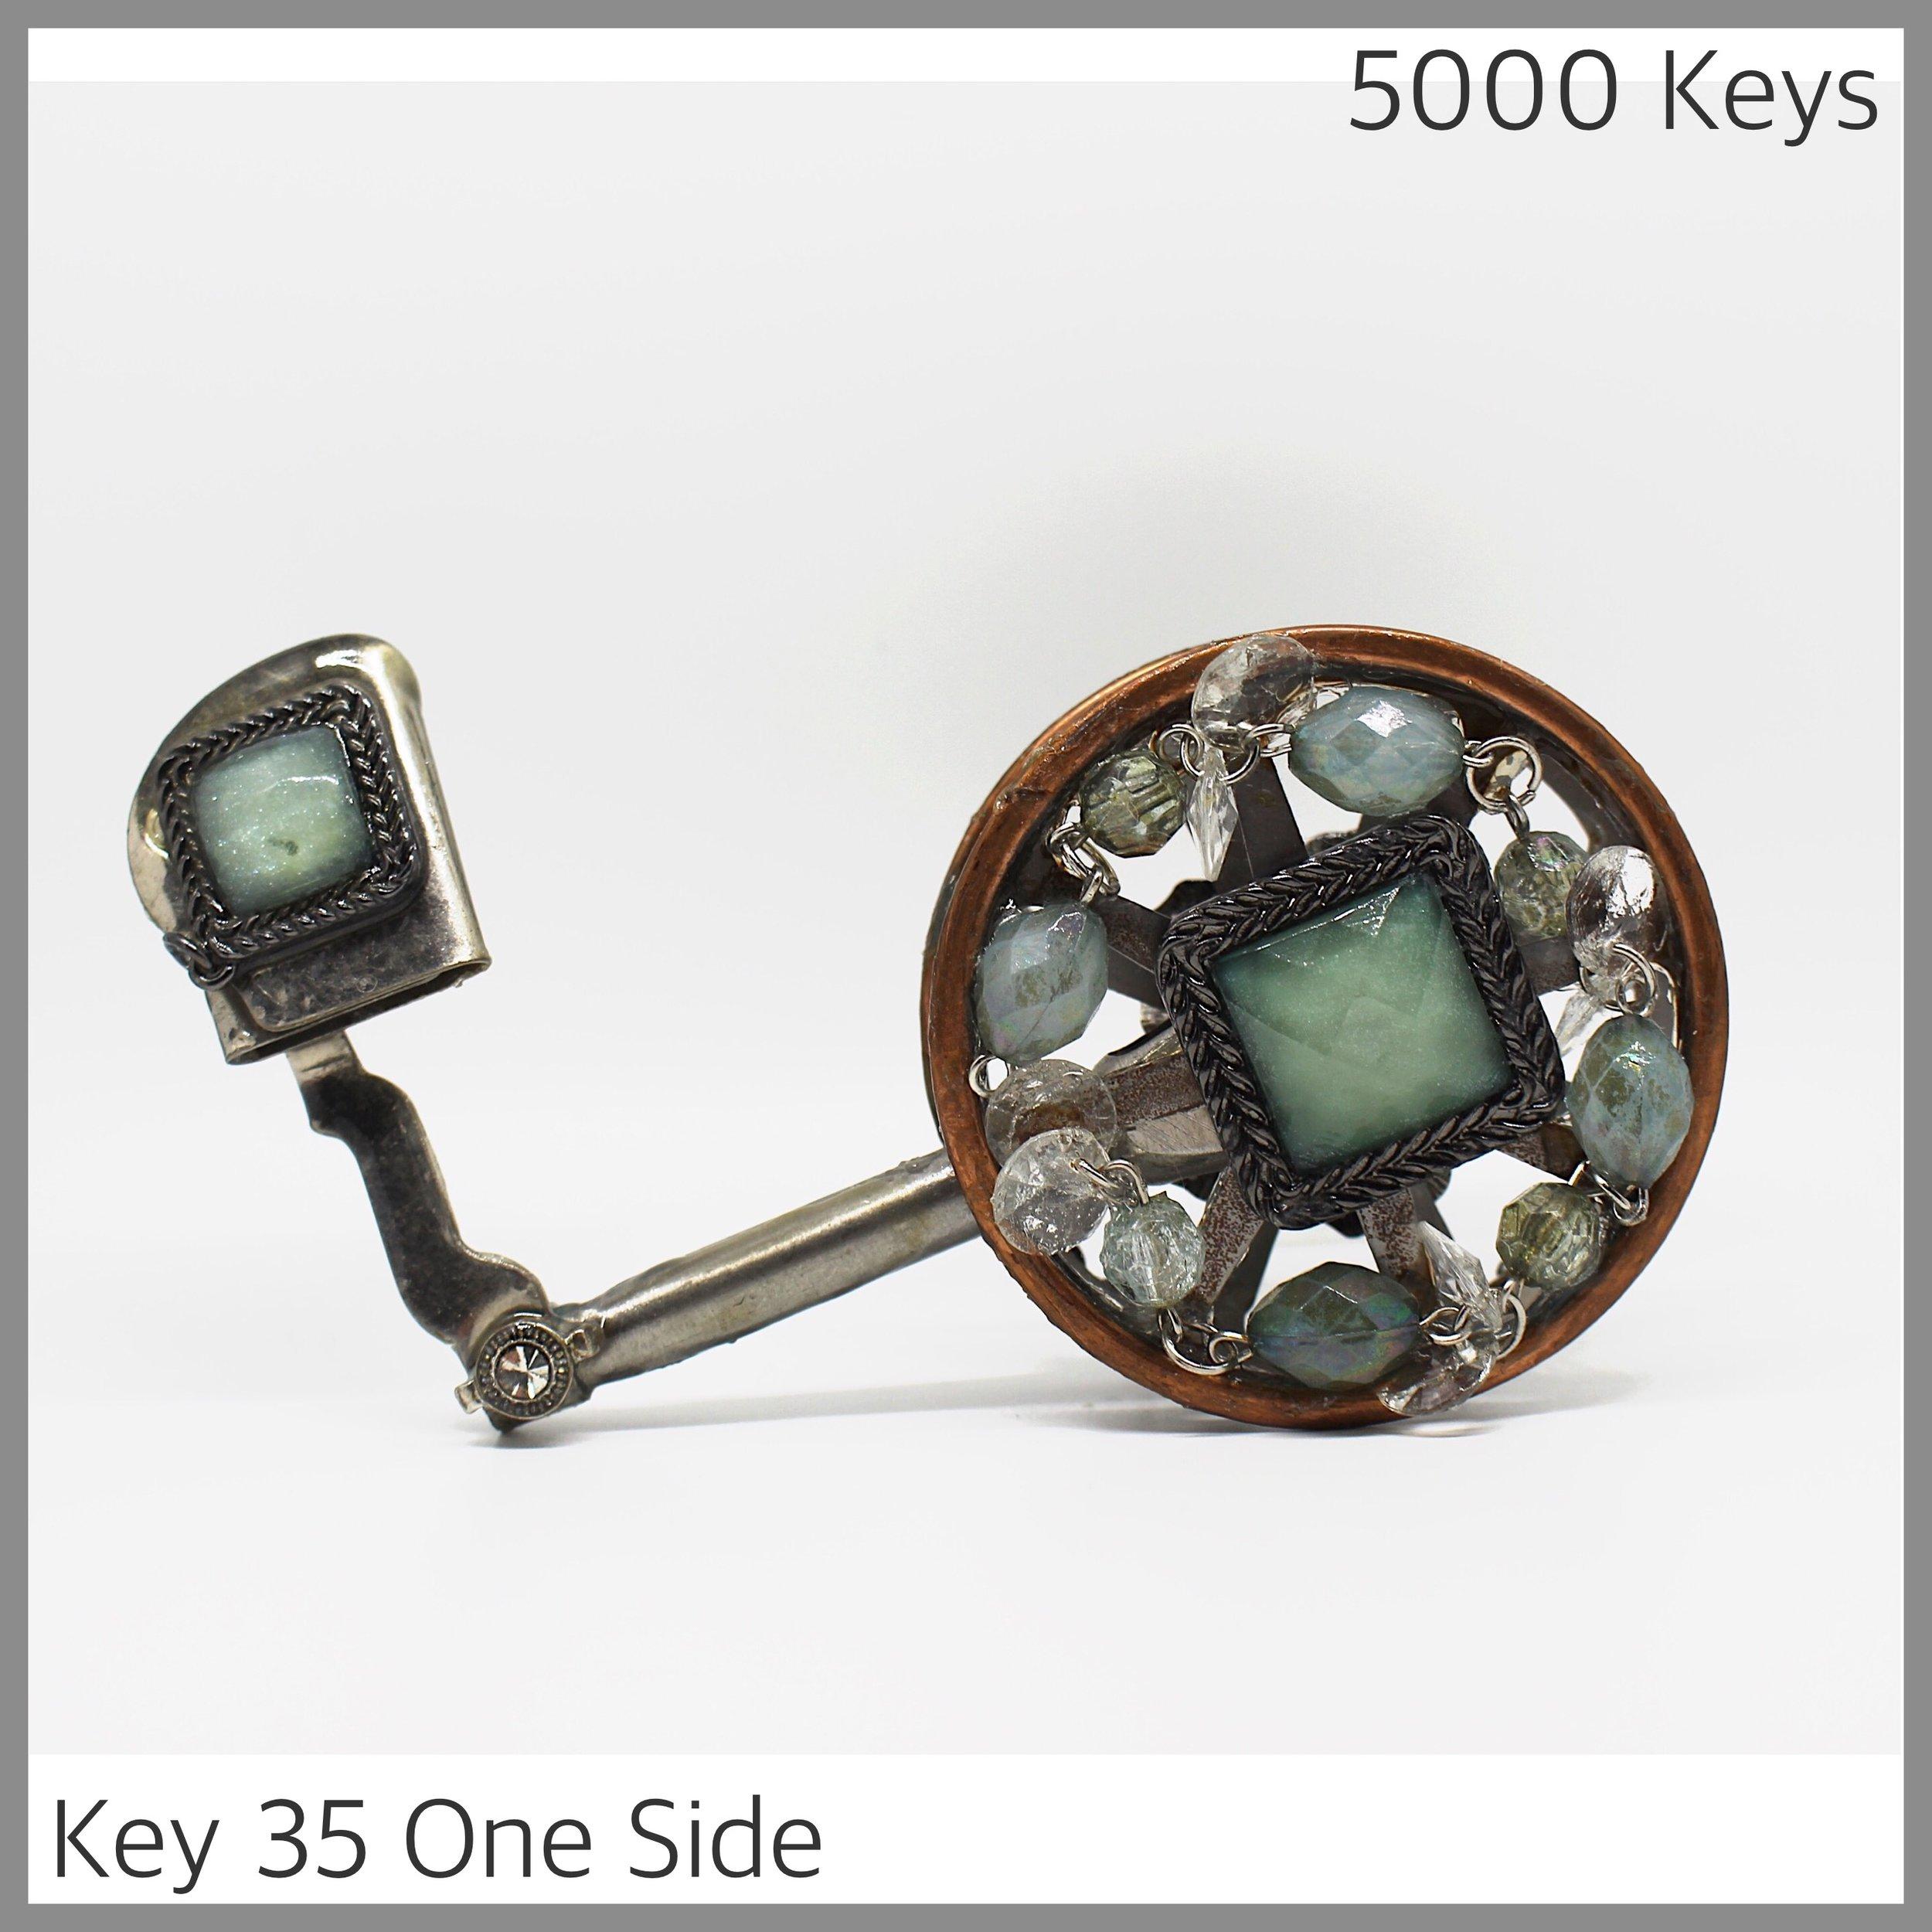 Key 35 one side.JPG